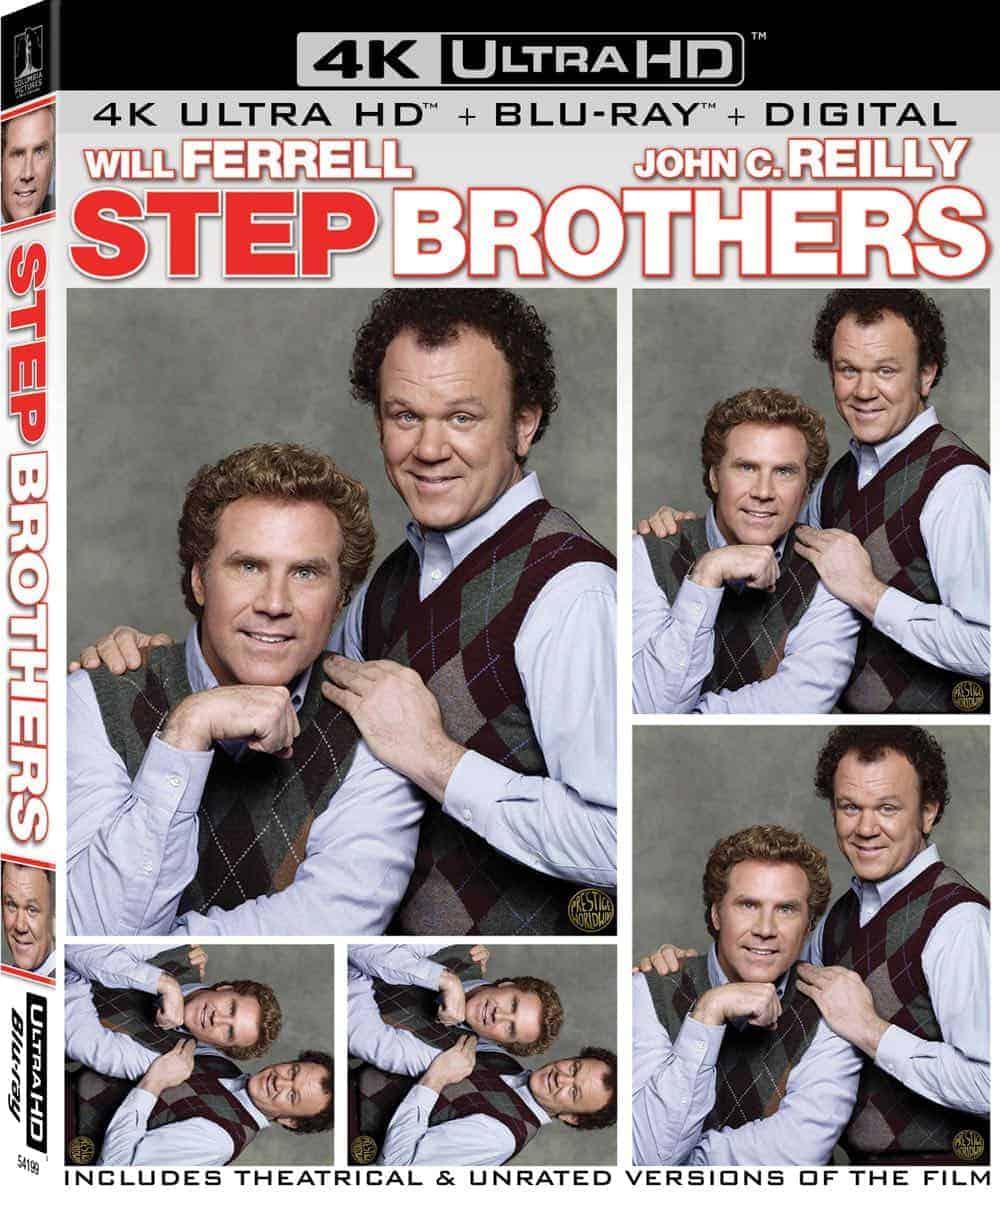 STEP BROTHERS 4KUHD ORING PACKSHOT2